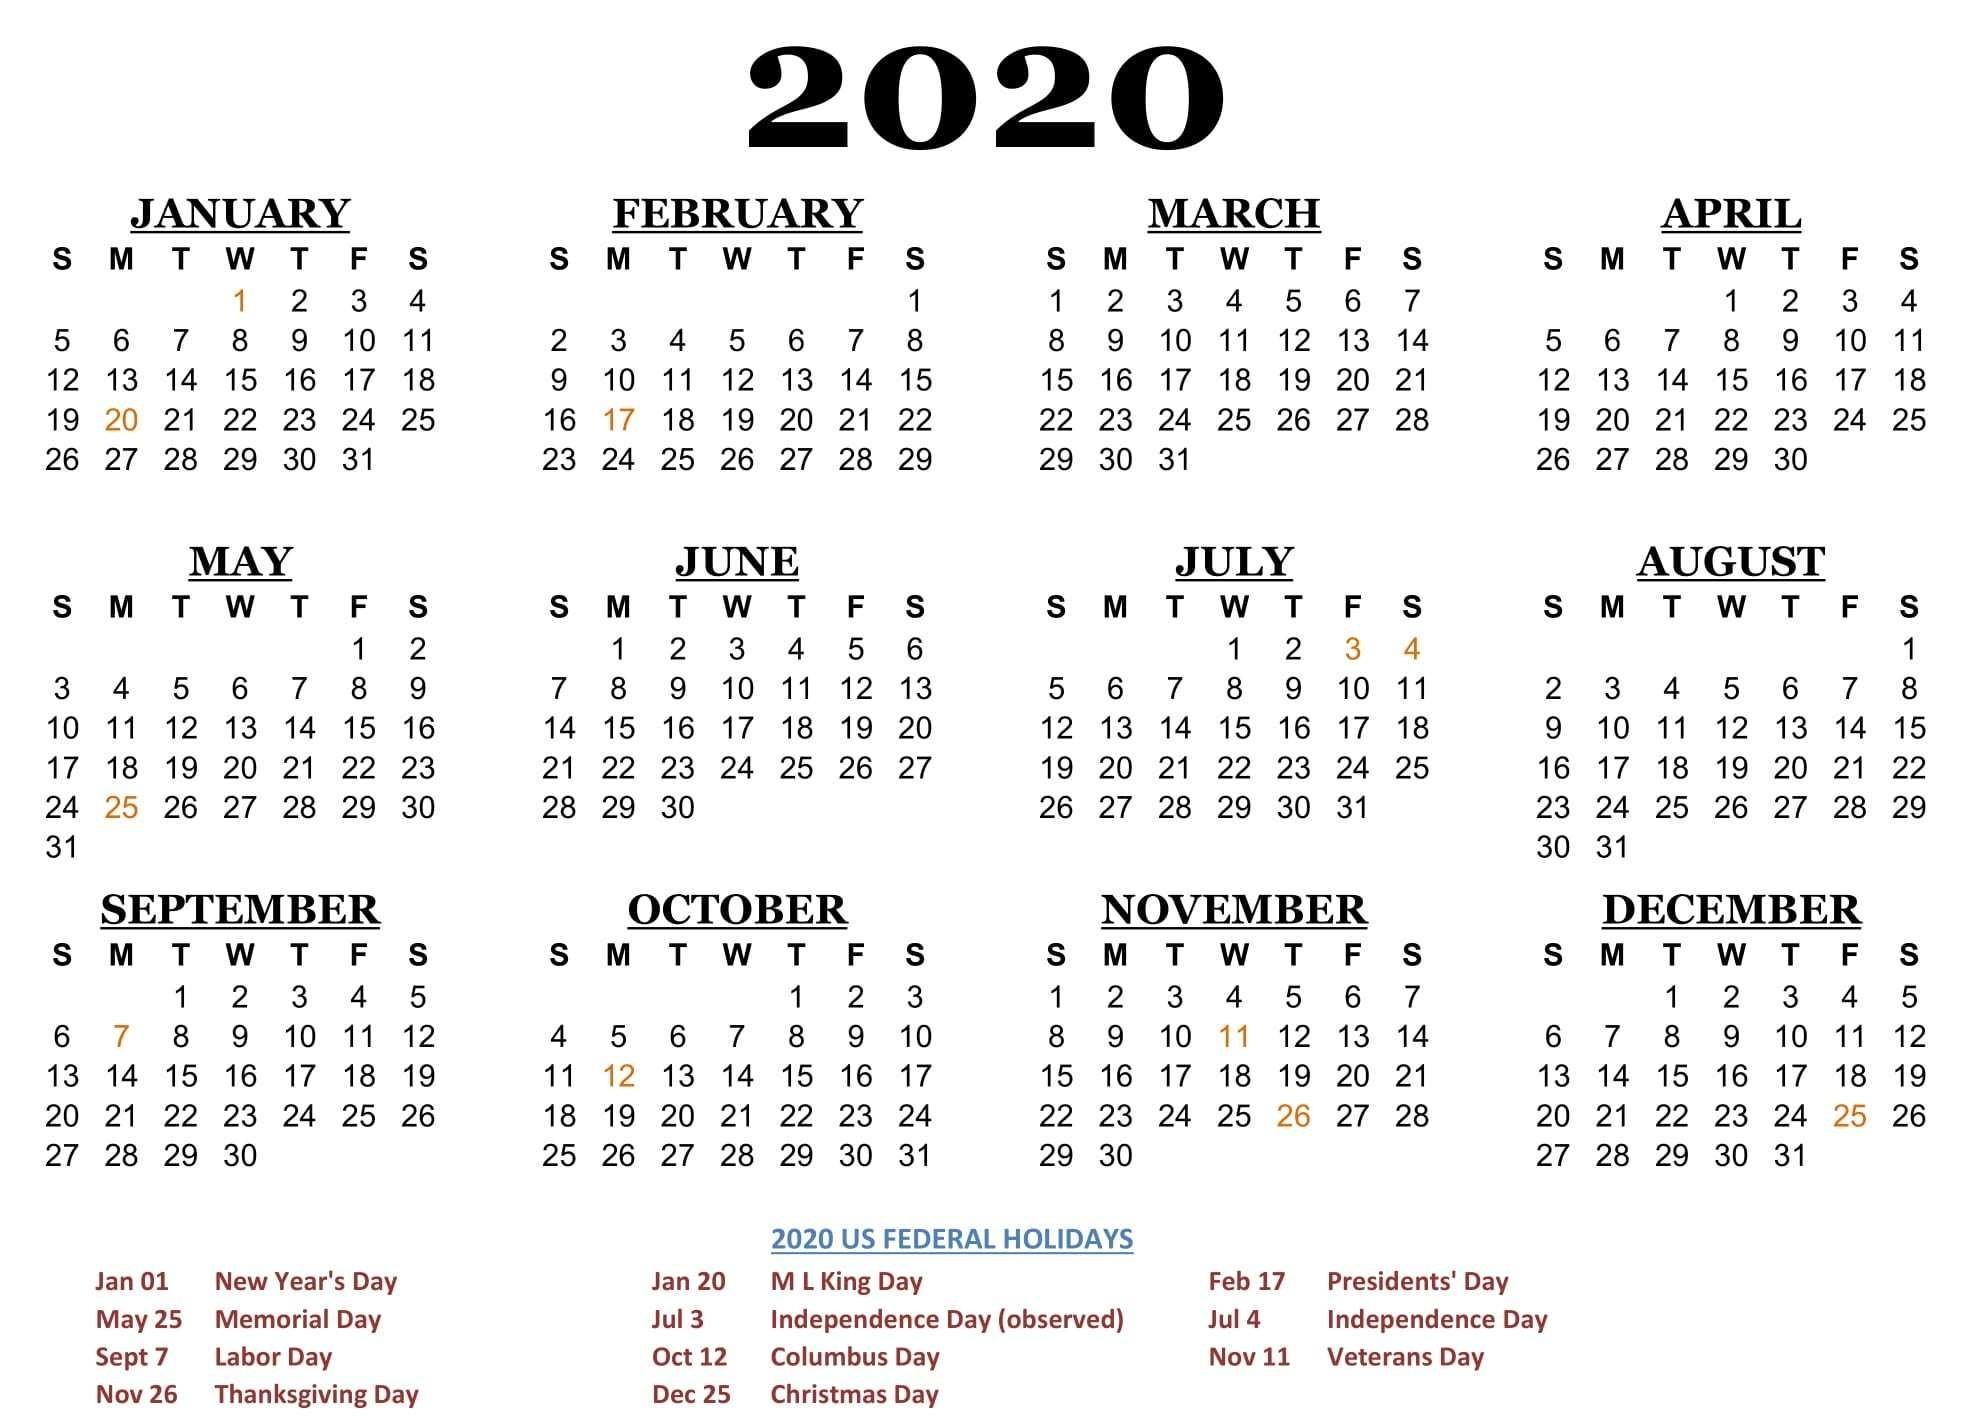 2020 One Page Calendar Printable Download | Calendarbuzz  Year 2020 Calendar Printable